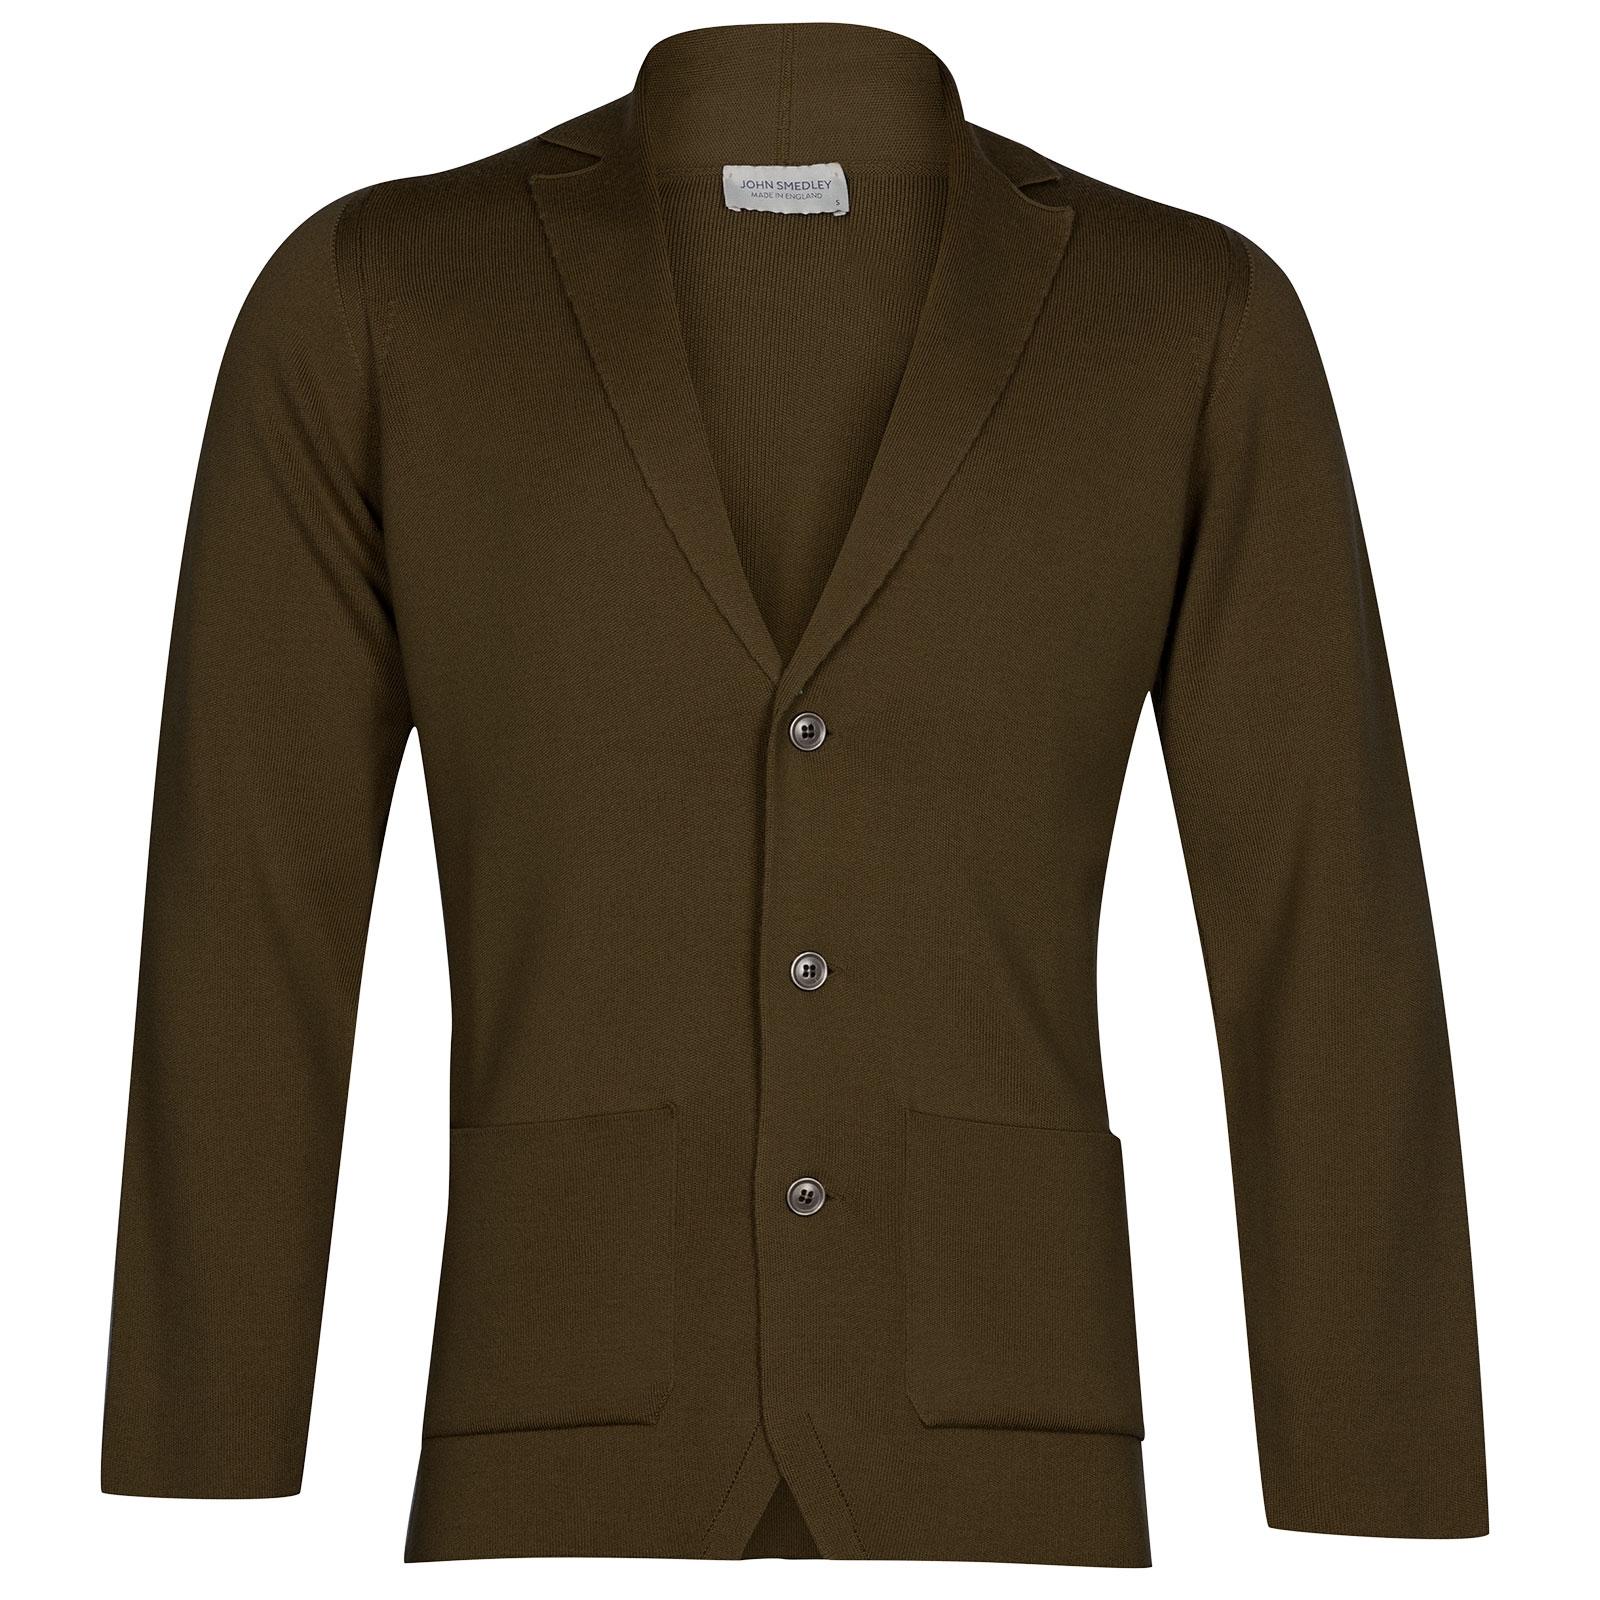 John Smedley Oxland Merino Wool Jacket in Khaki-S